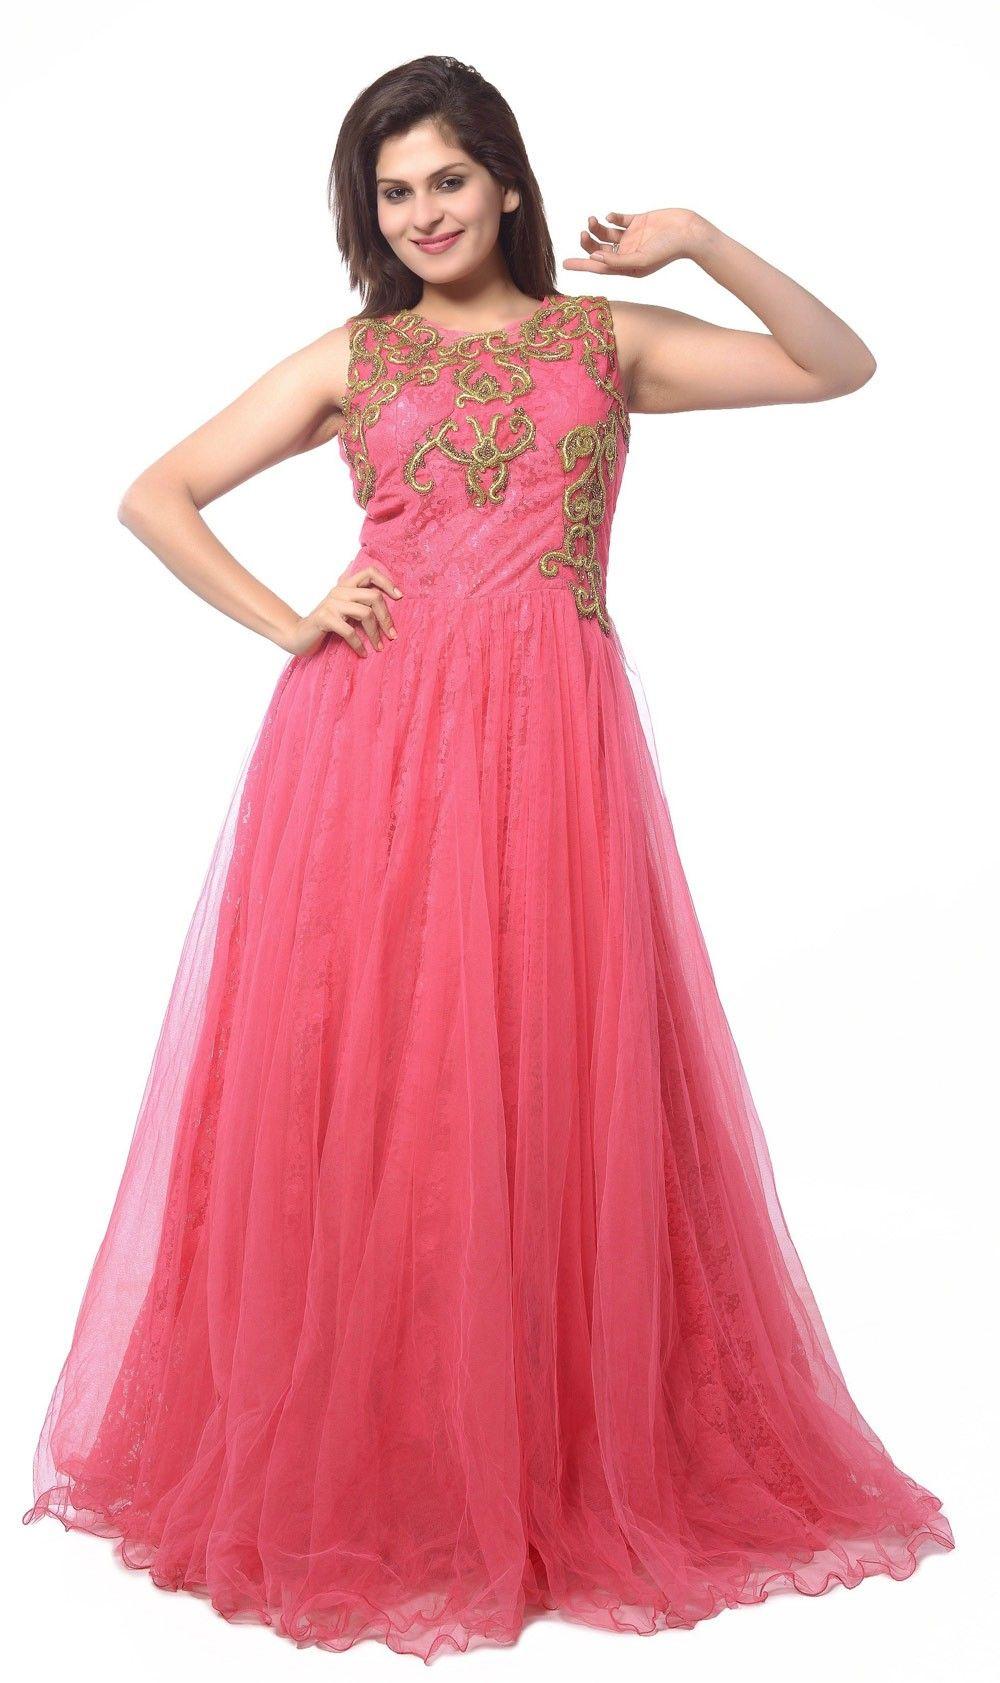 Designer evening dresses india | my kurtis | Pinterest | Dress ...